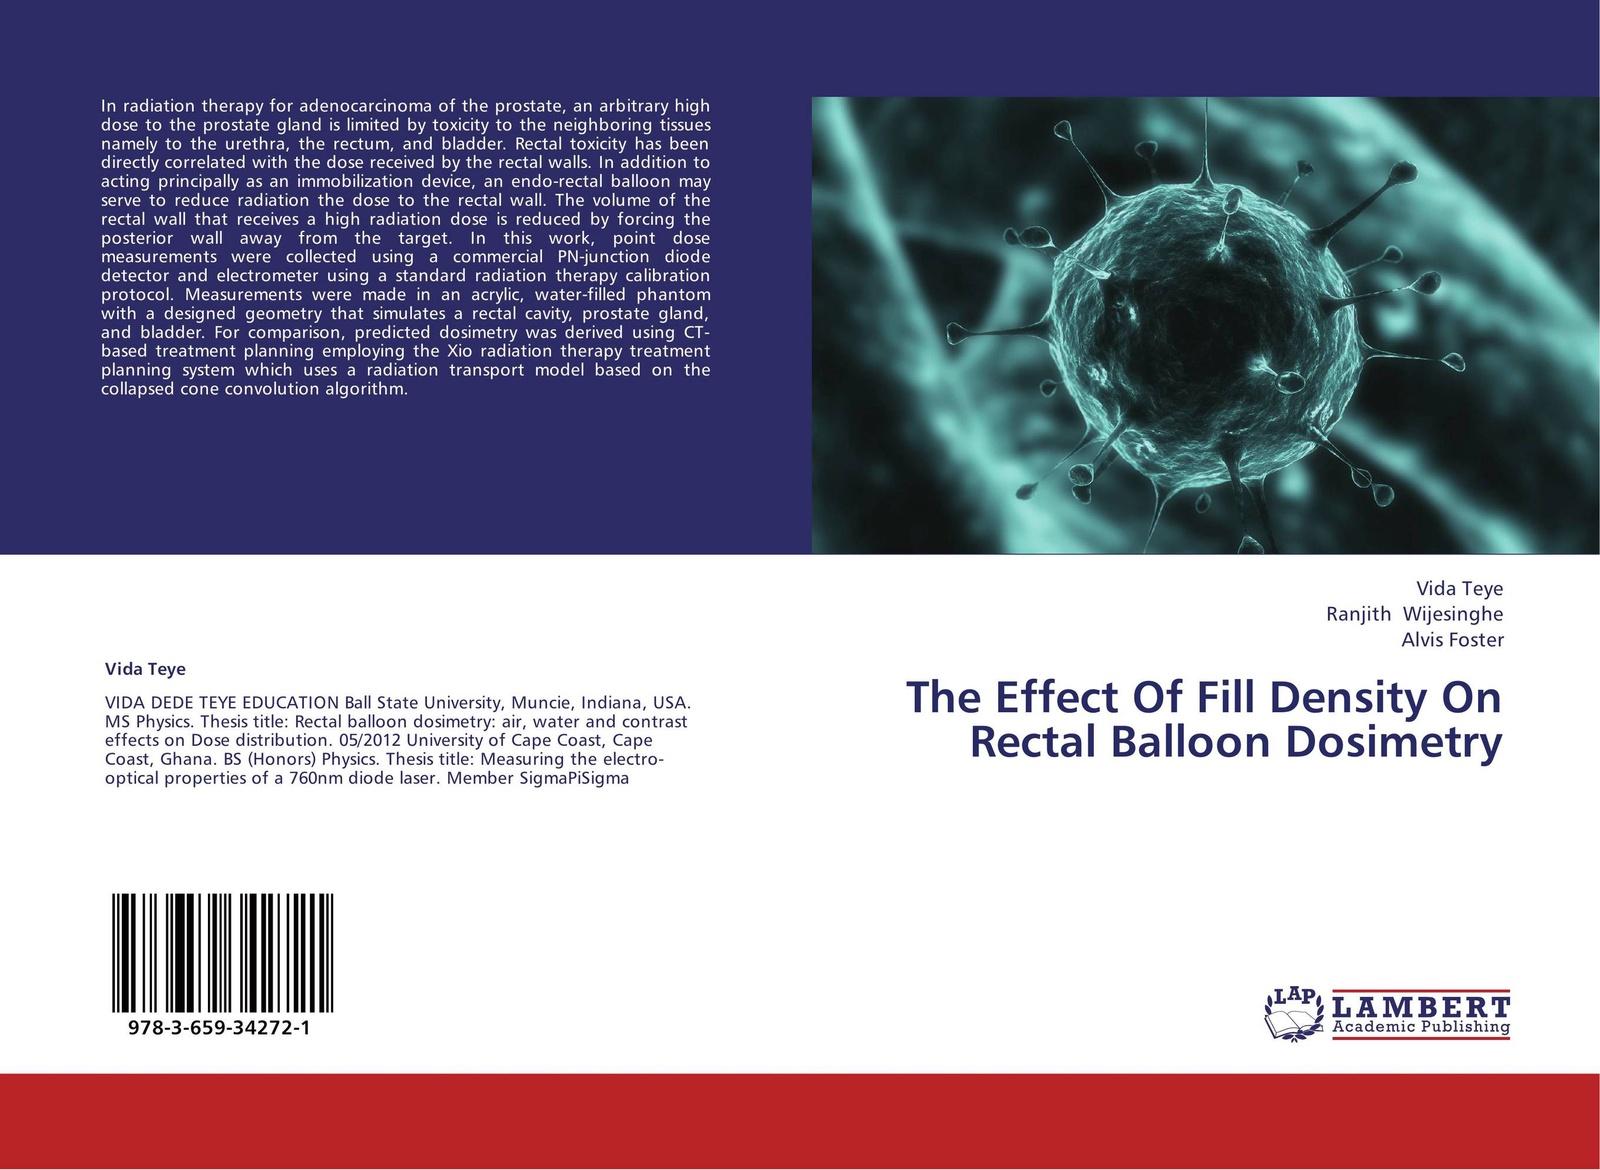 Vida Teye,Ranjith Wijesinghe and Alvis Foster The Effect Of Fill Density On Rectal Balloon Dosimetry bix lv39 advanced rectum check simulator rectal touch examination model mq108